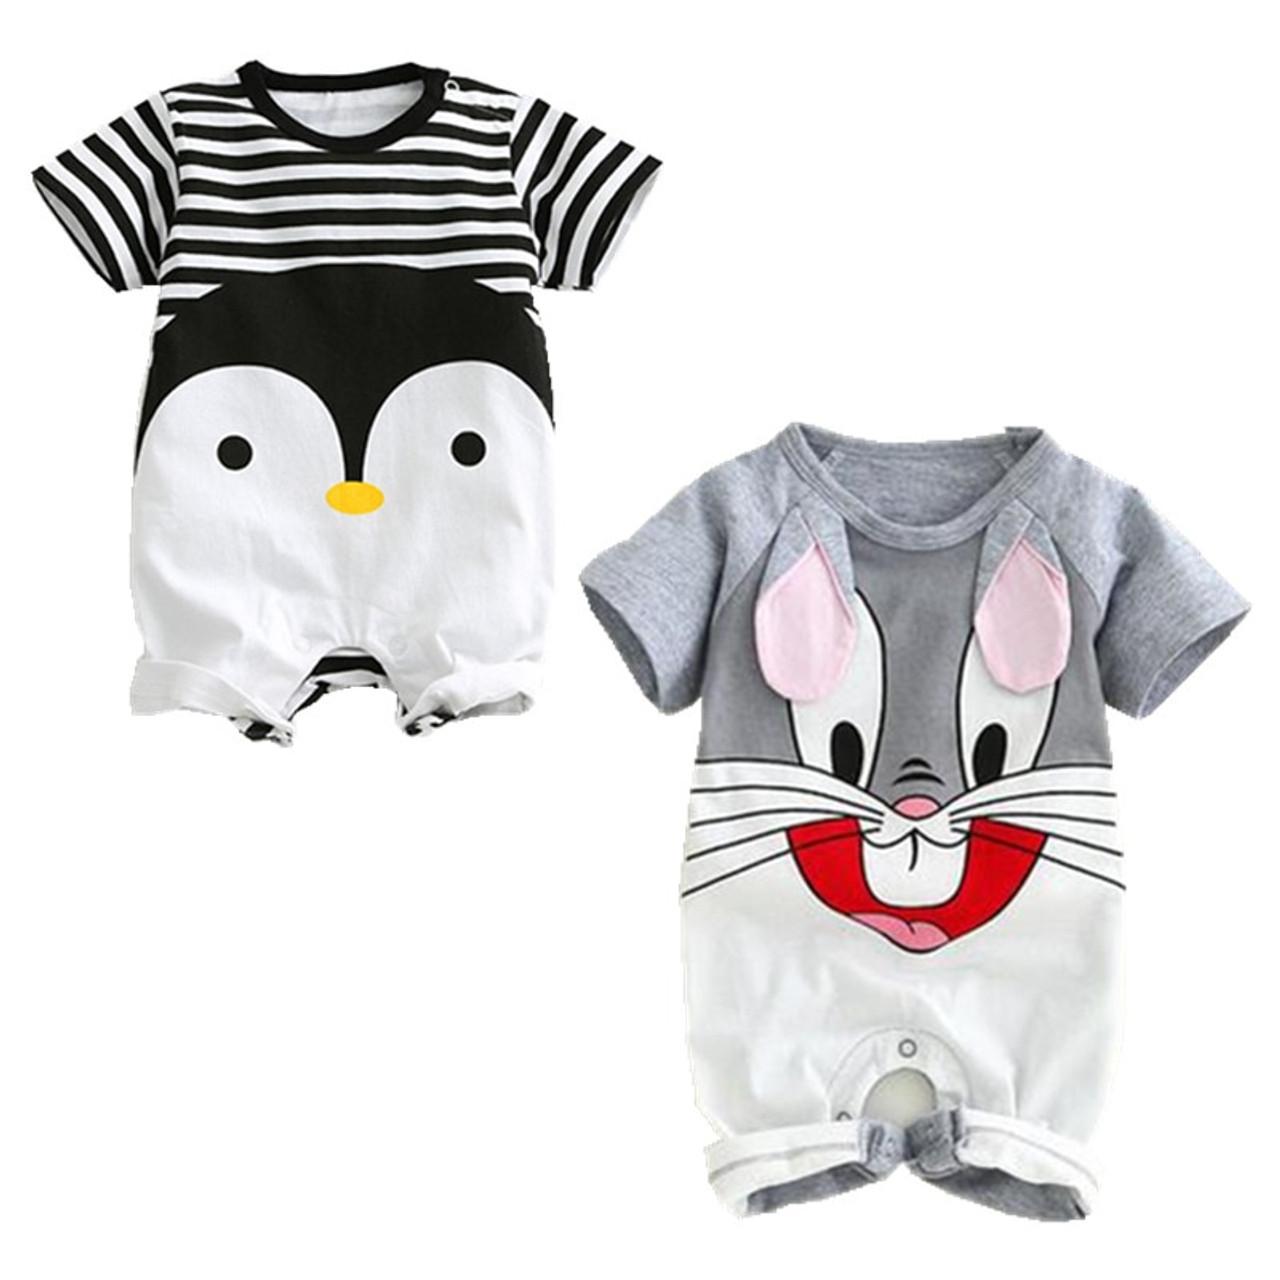 9f6ace2c6e75 ... Cartoon Animals Monkey Cotton Baby Rompers Rabbit Short-Sleeve Baby Boy  Clothes Summer Monkey Infant ...